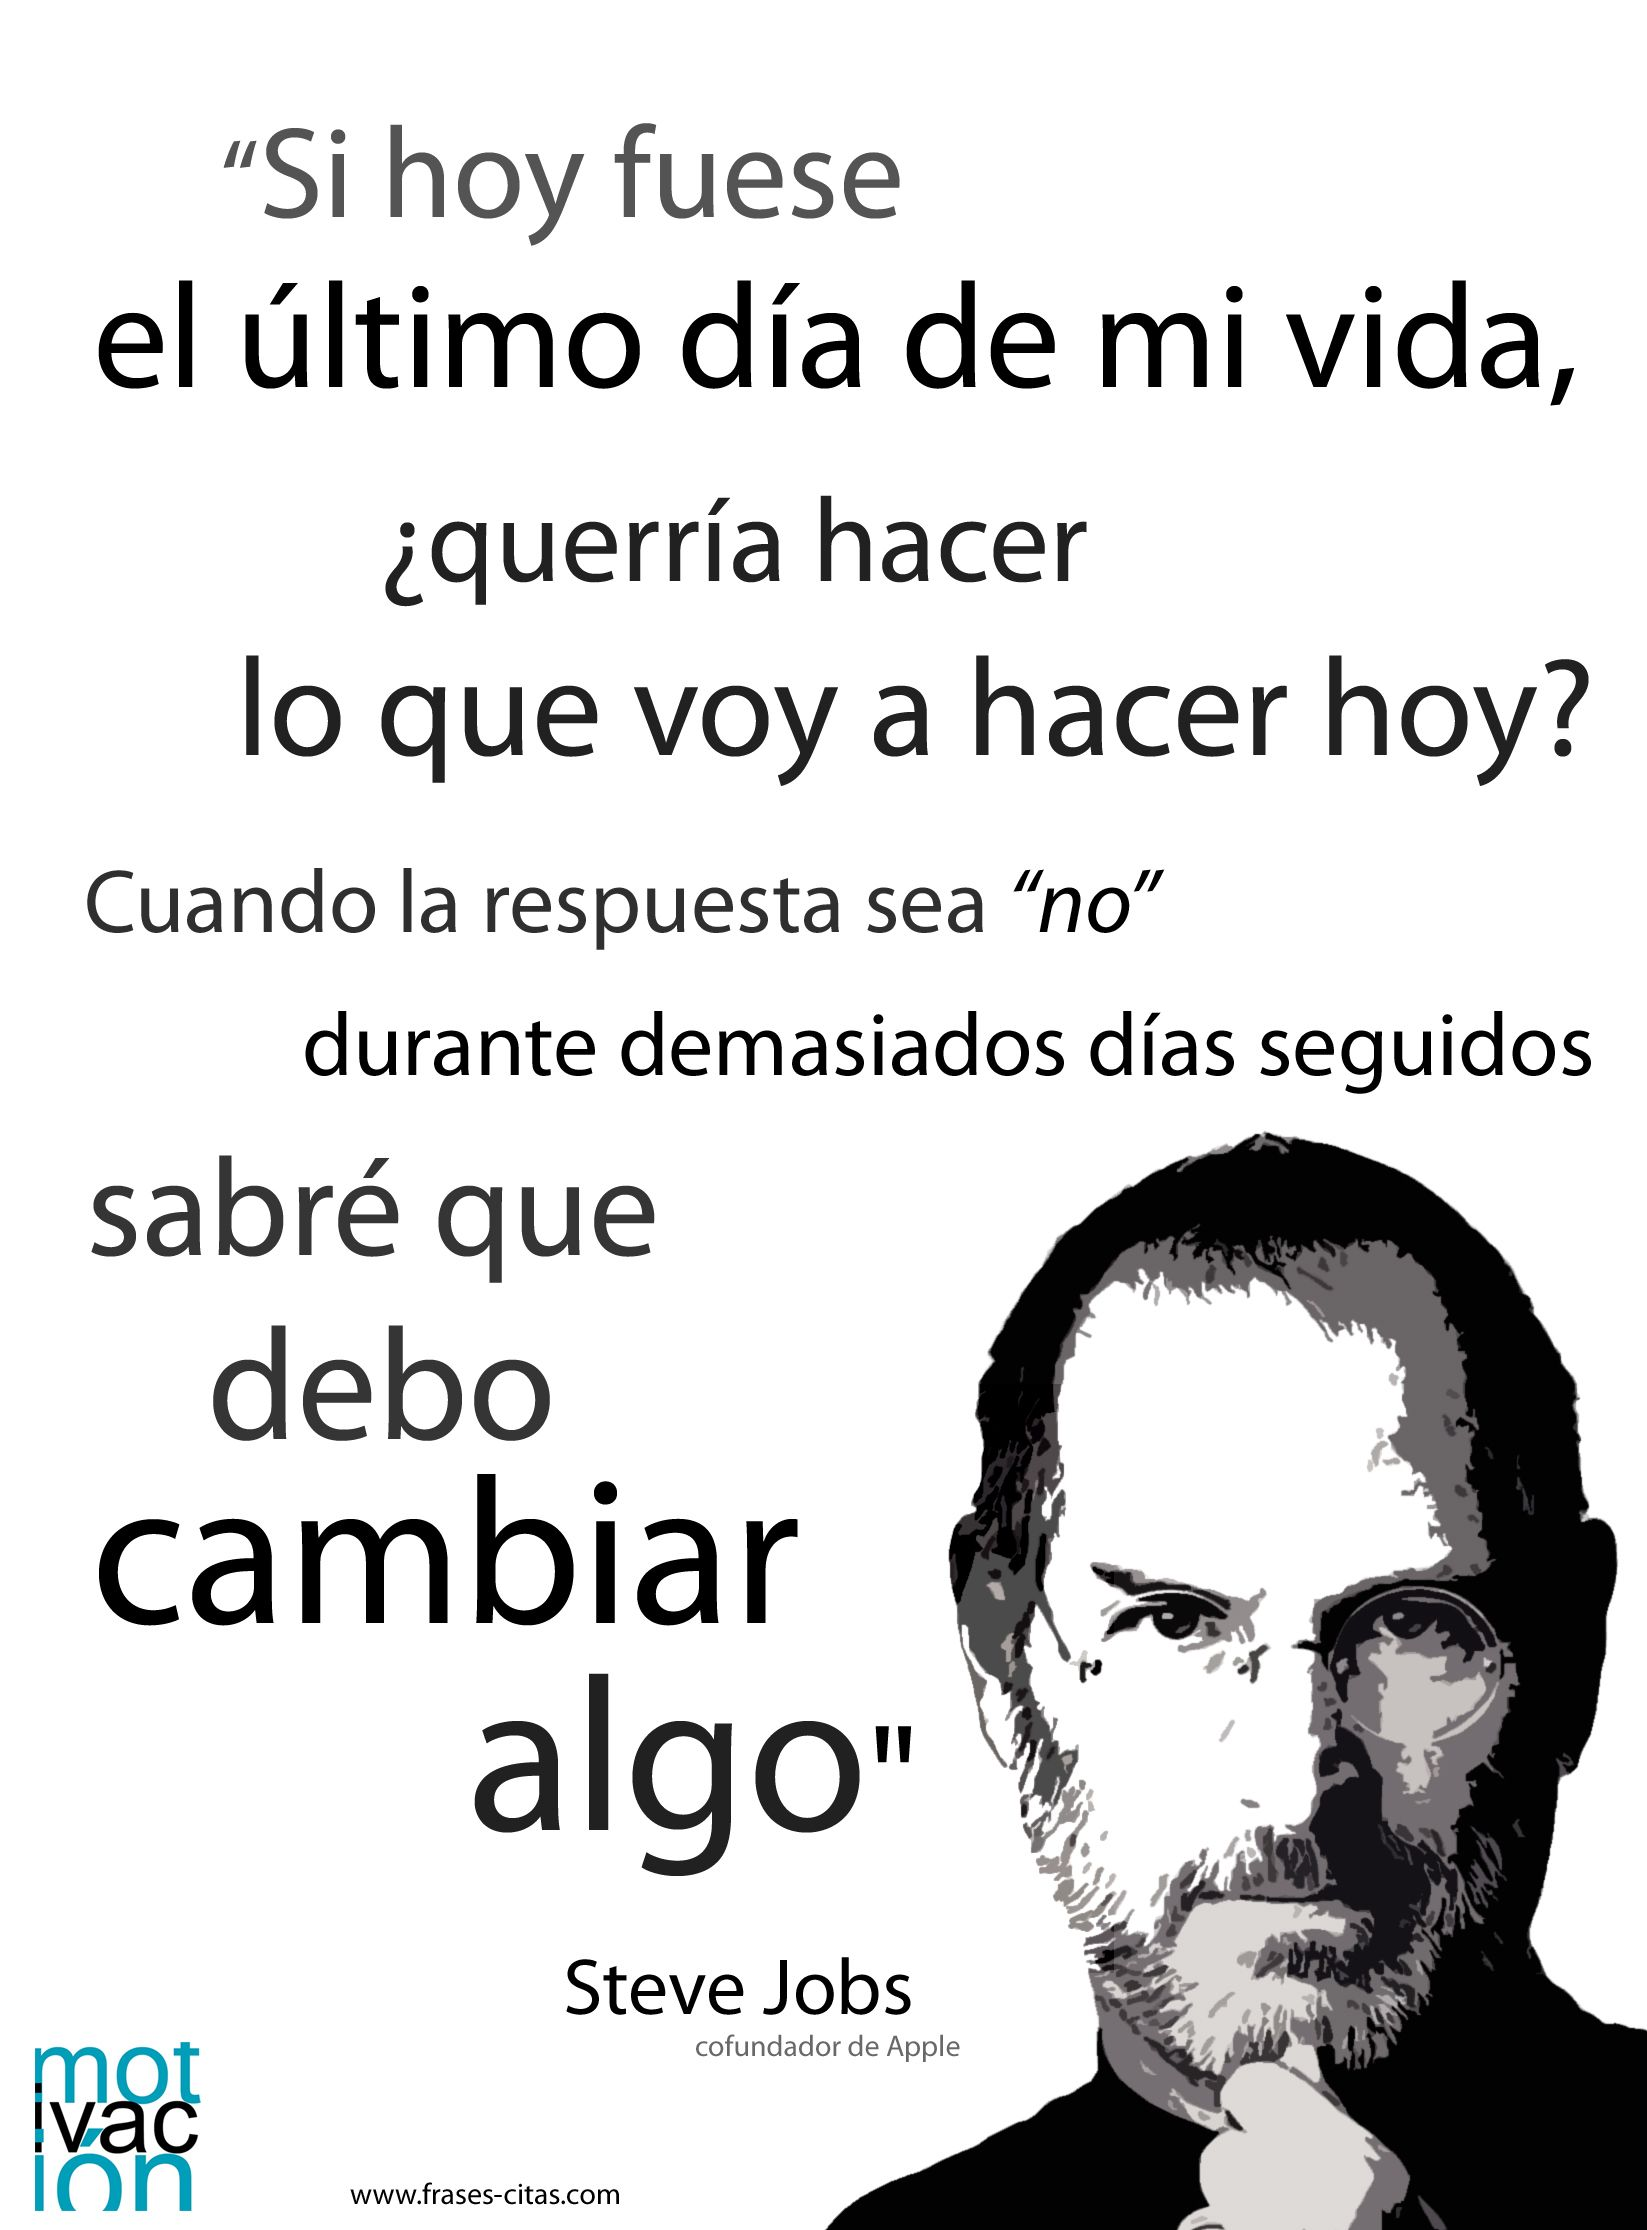 Vida Y Cambio Segun Steve Jobs Http Www Frases Citas Com 2013